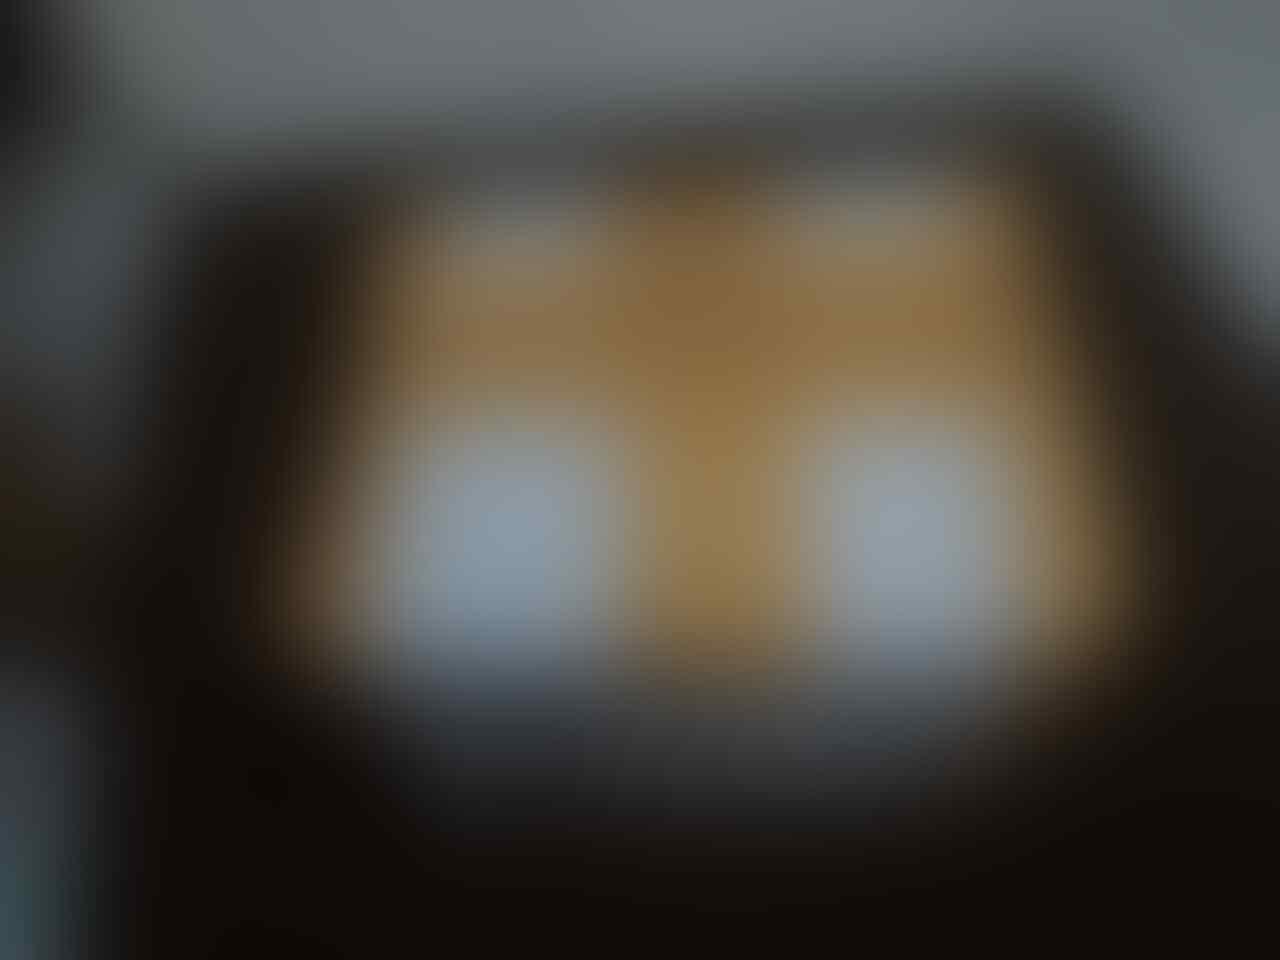 Jasa Isi Hardisk Game PC - Film HD Bluray (COD Bekasi Kota)